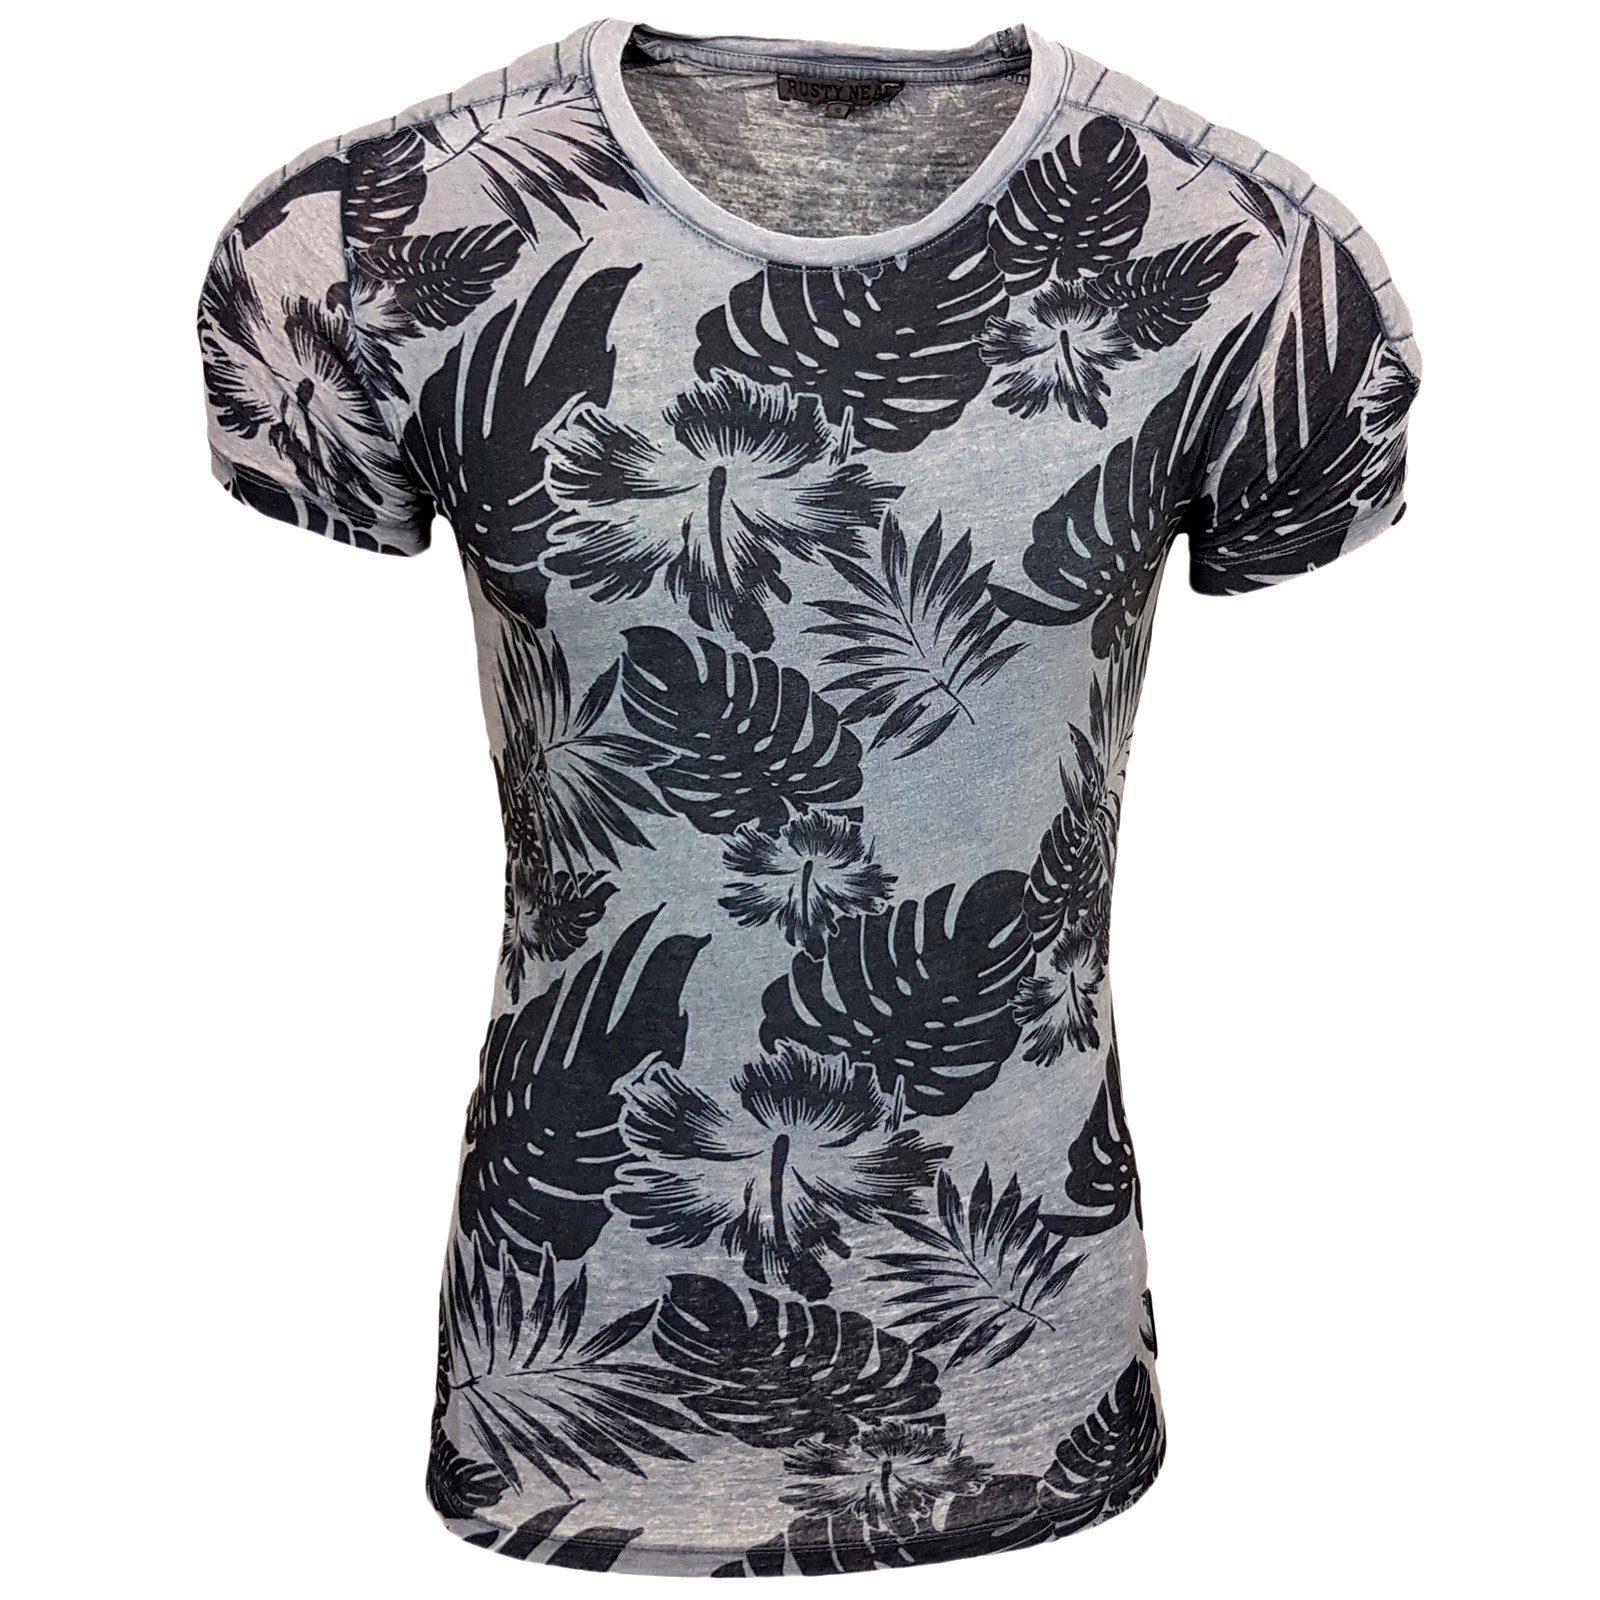 Rusty Hochwertigem Mit Allover T shirt print Neal rBxeWdCo